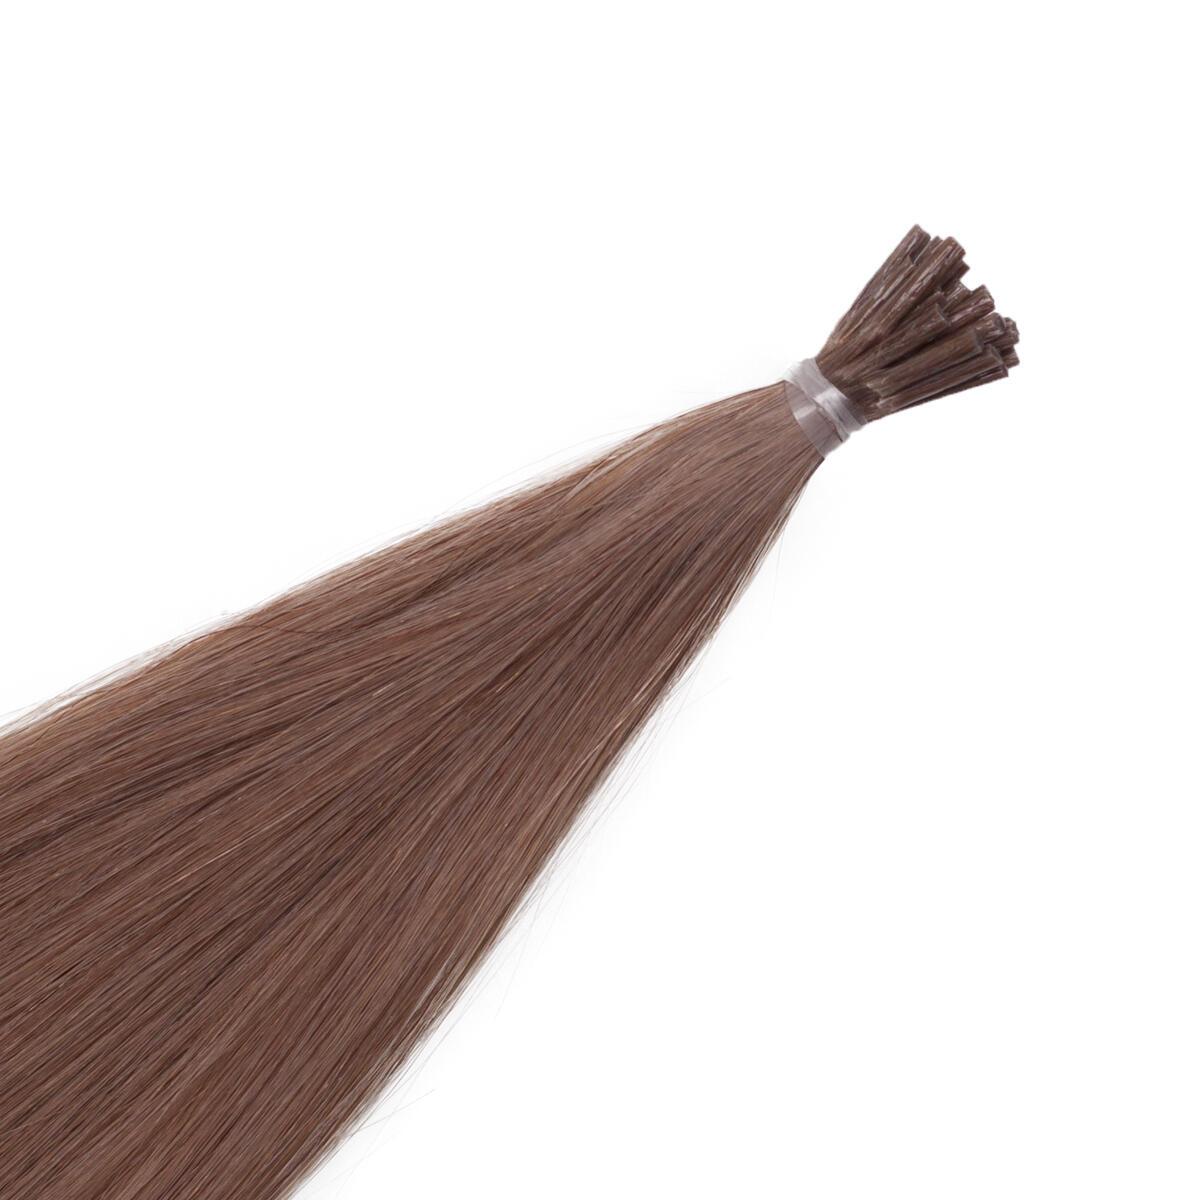 Stick Hair 7.3 Cendre Ash 50 cm